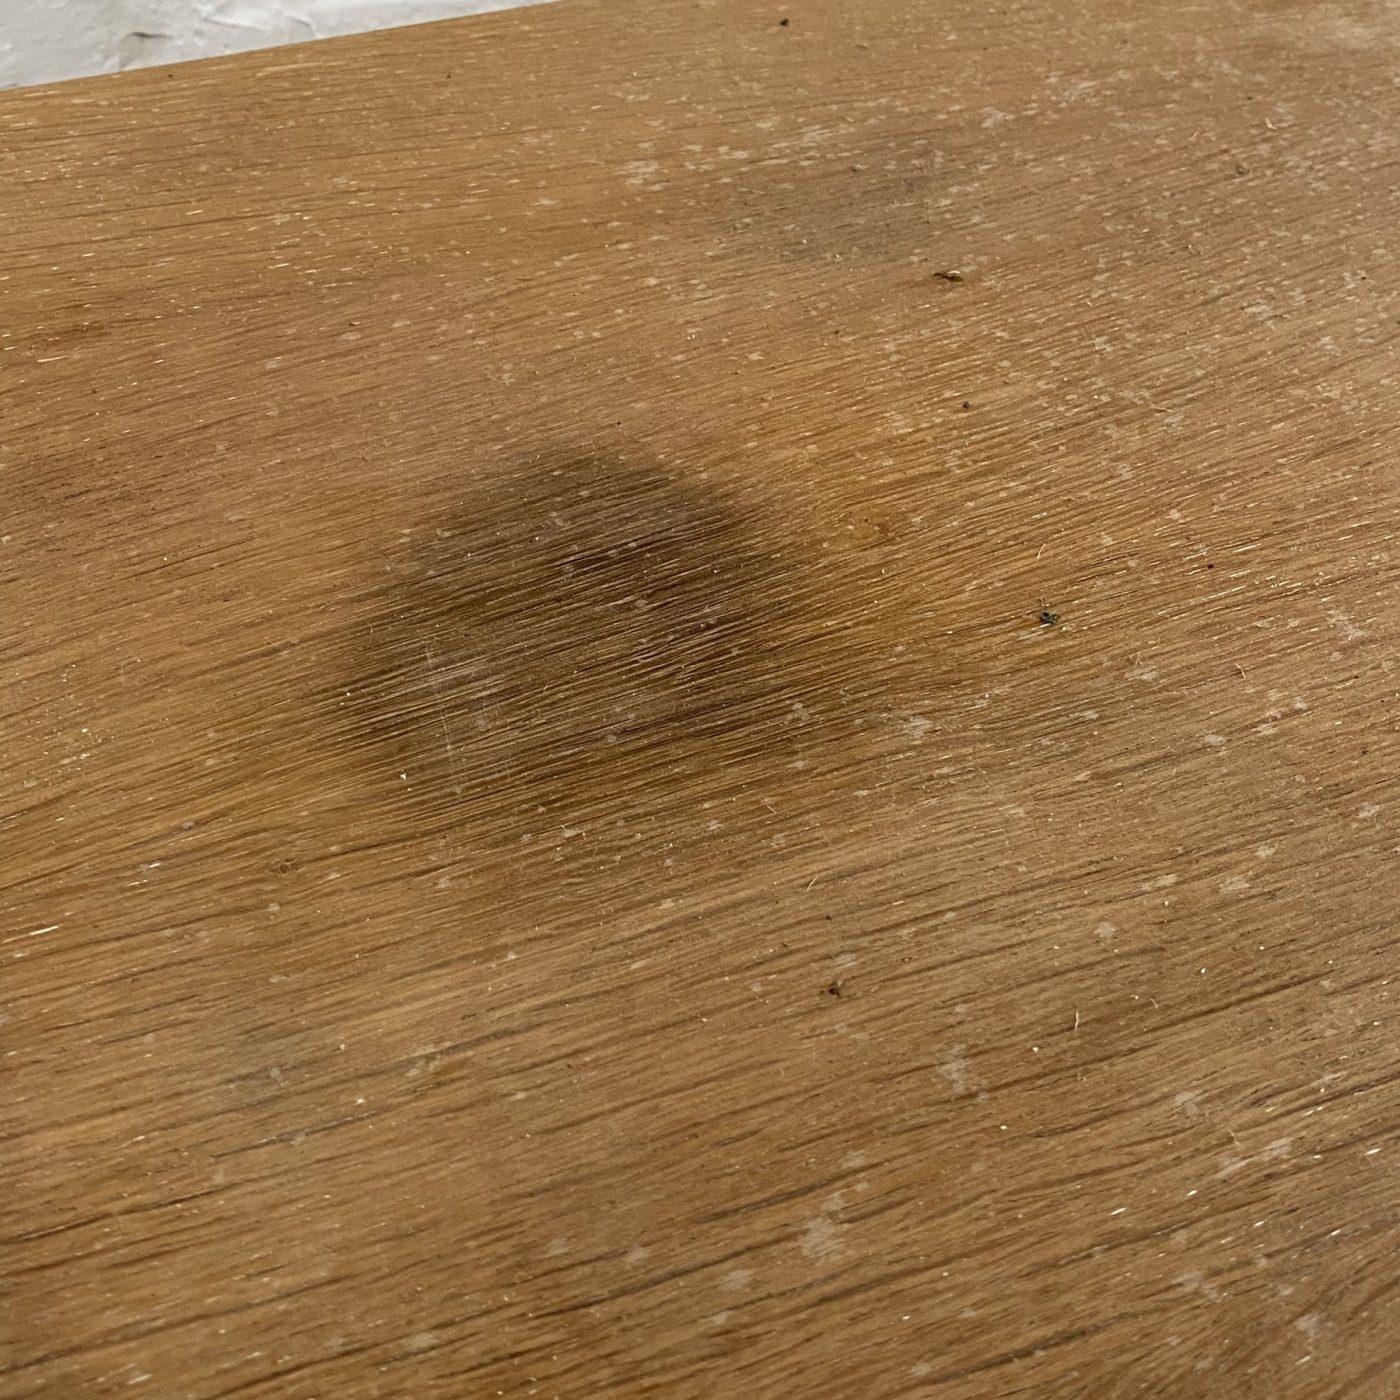 objet-vagabond-oak-sideboard0000